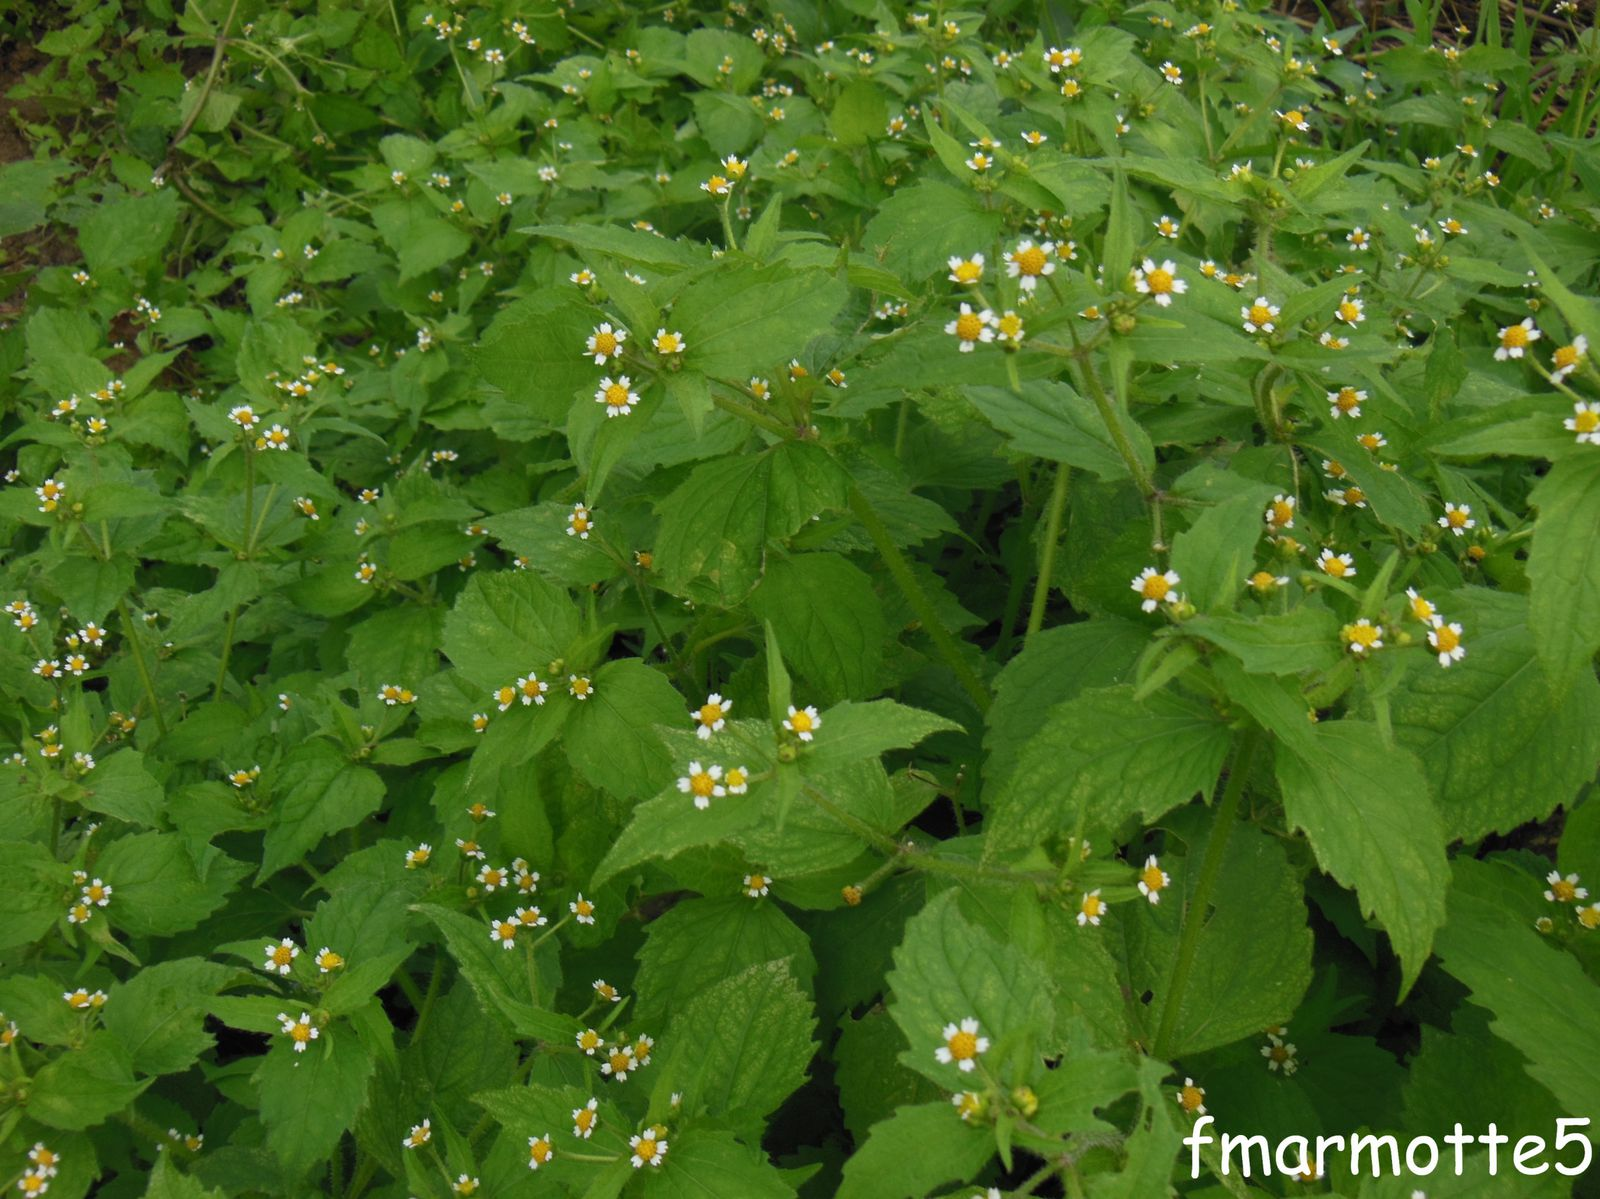 galinsoga plante invasive le blog de fmarmotte5